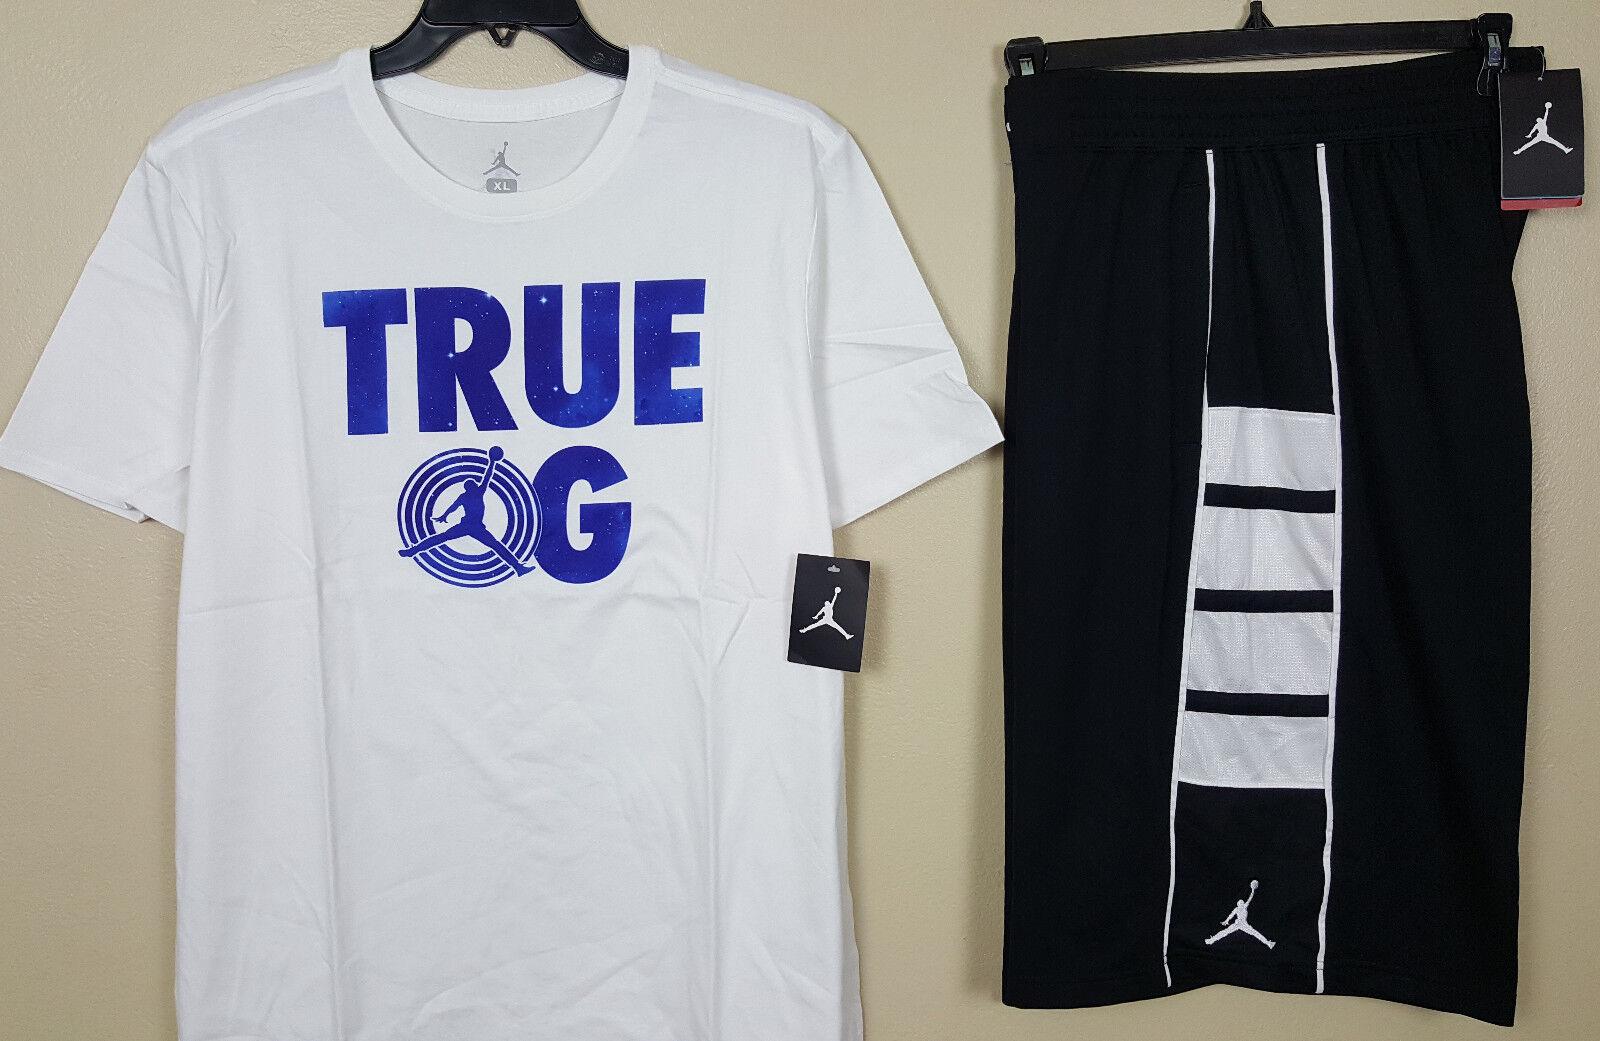 18fcd7d17e2 Nike Jordan Retro 11 True OG Outfit Shirt Shorts White Blue RARE ...